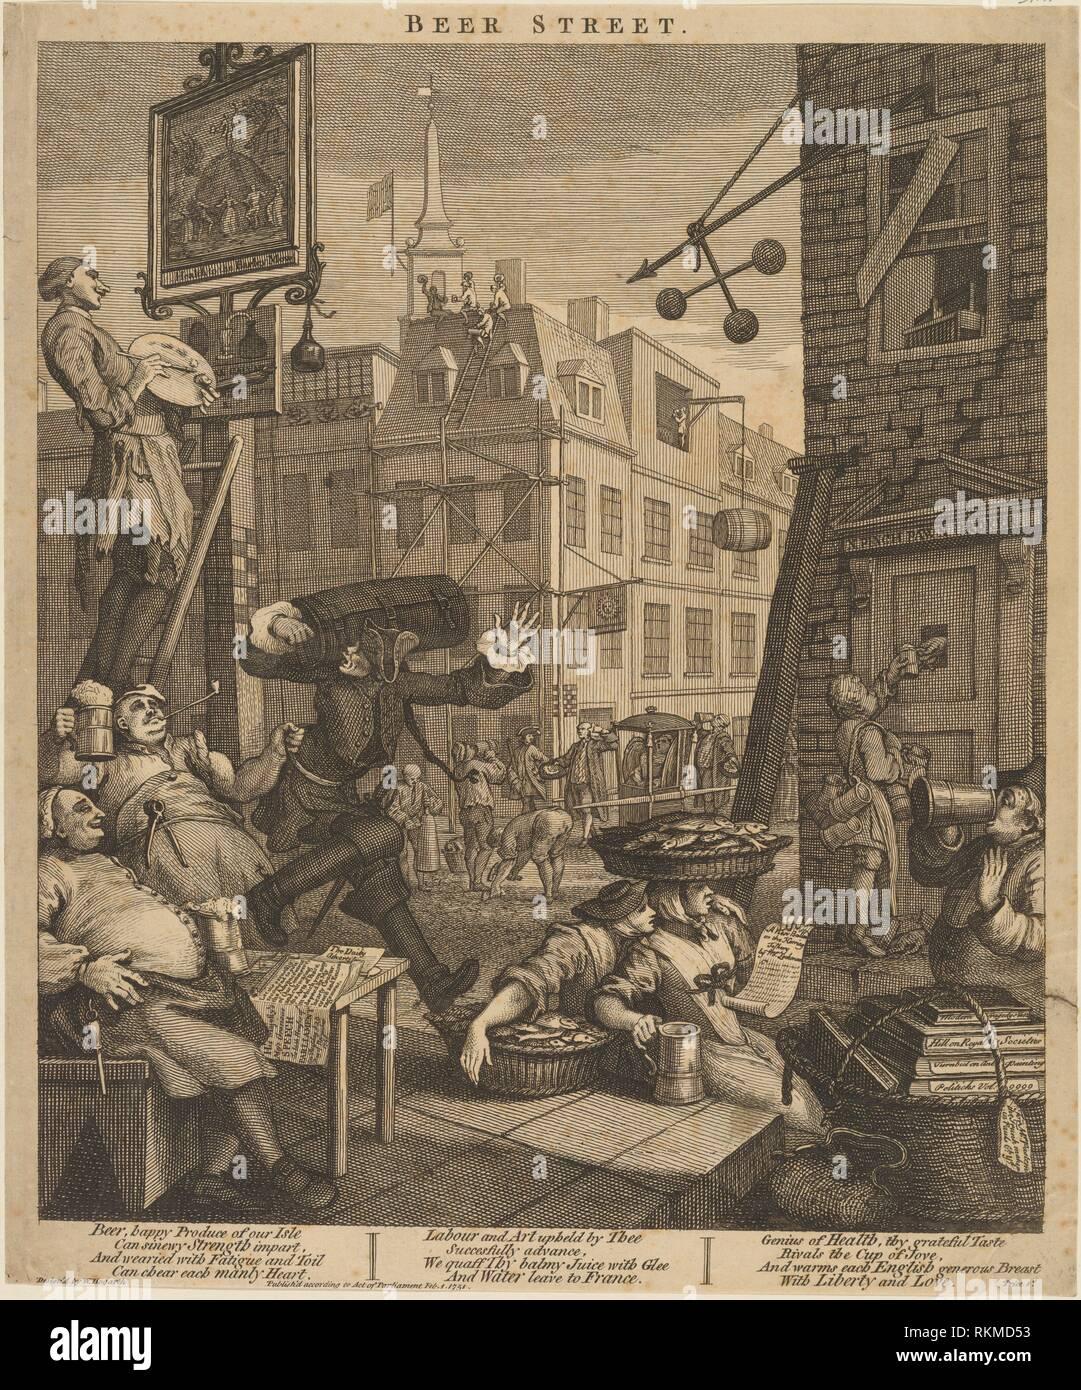 Beer Street. Hogarth, William, 1697-1764 (Printmaker). William Hogarth: prints. Date Created: 1751. Prints. Still image. - Stock Image